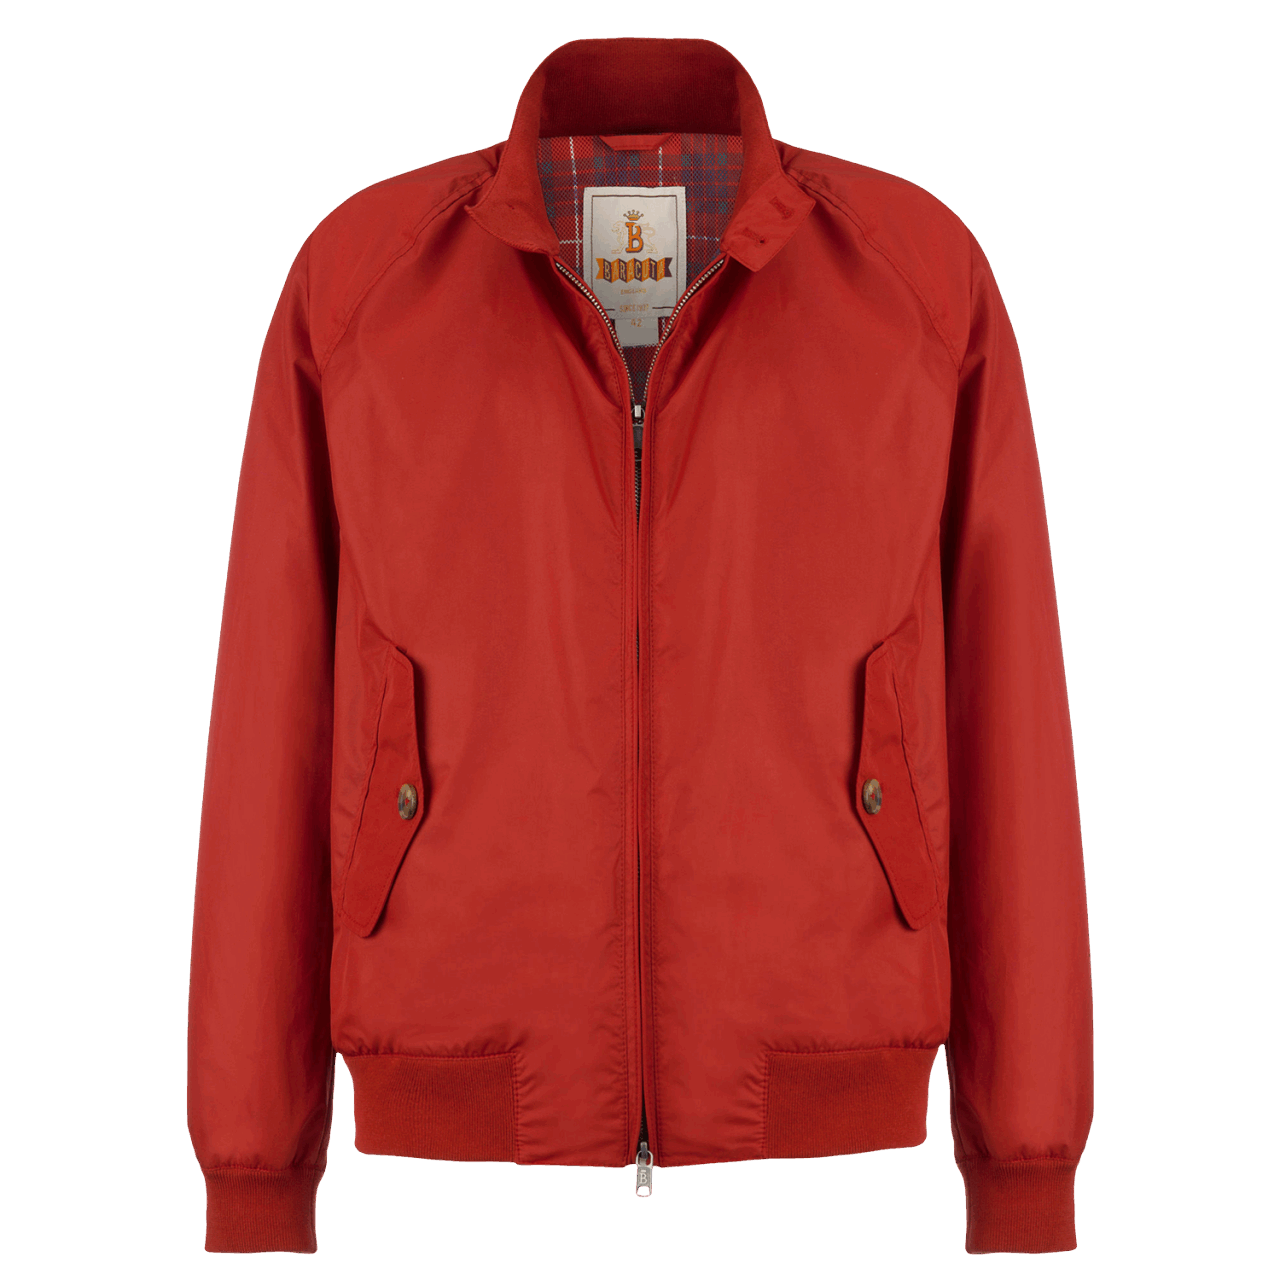 Baracuta G9 Jacke - dark red